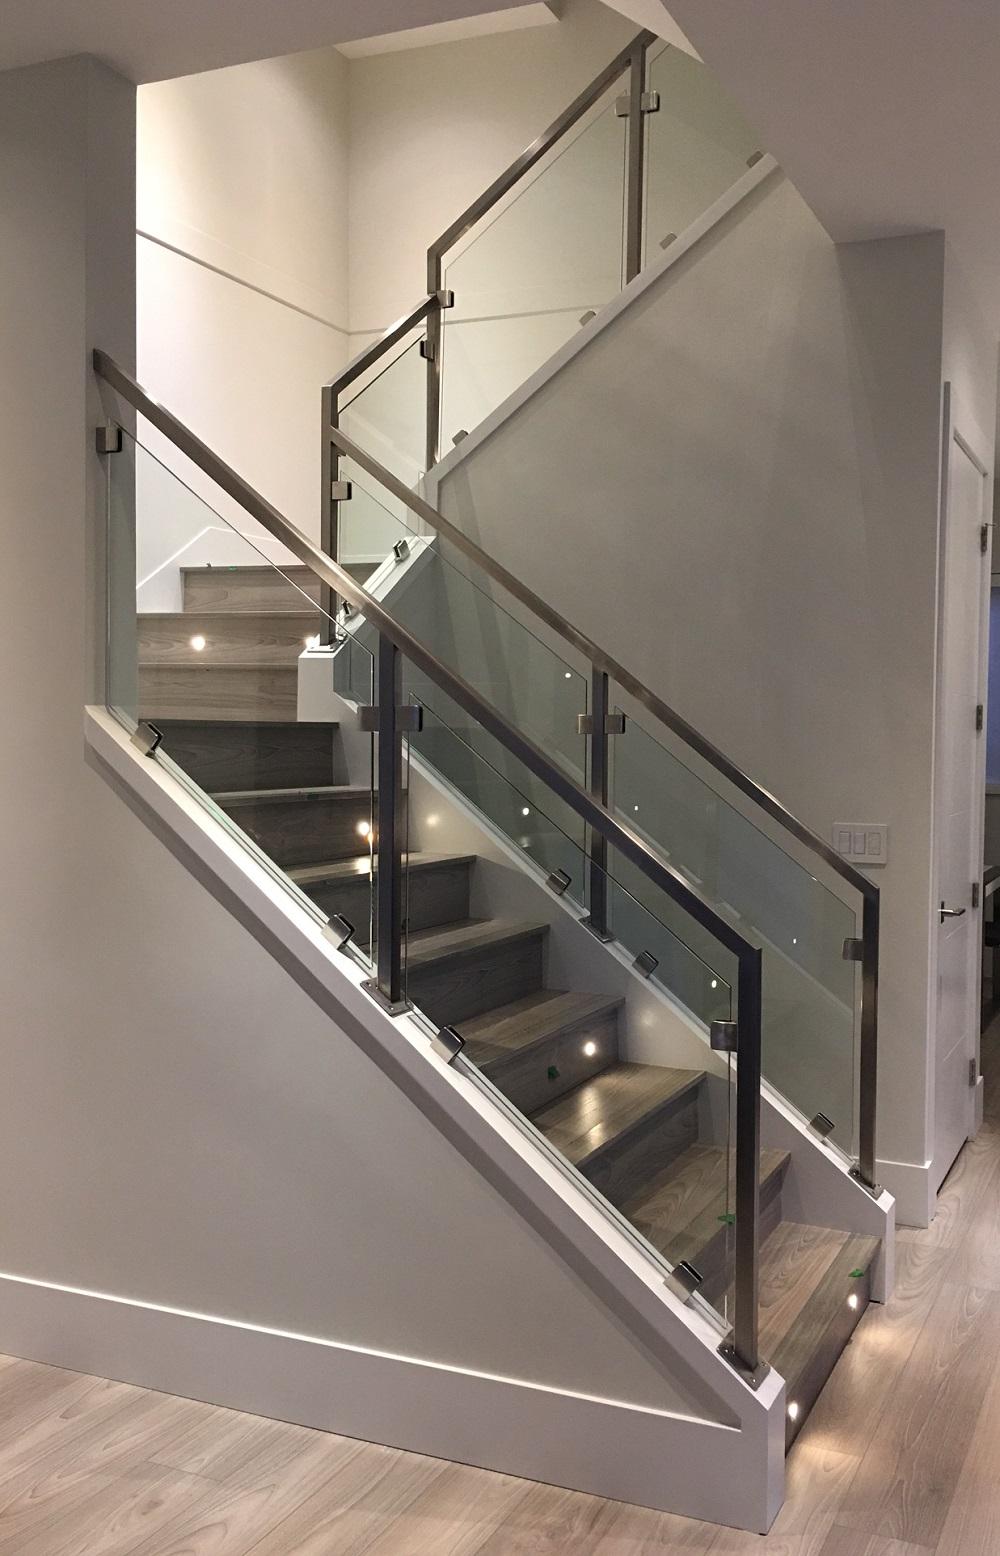 Glass Stair Railings Interior: Modern Interior Stair Railings, Stainless Steel, Richmond, Bc